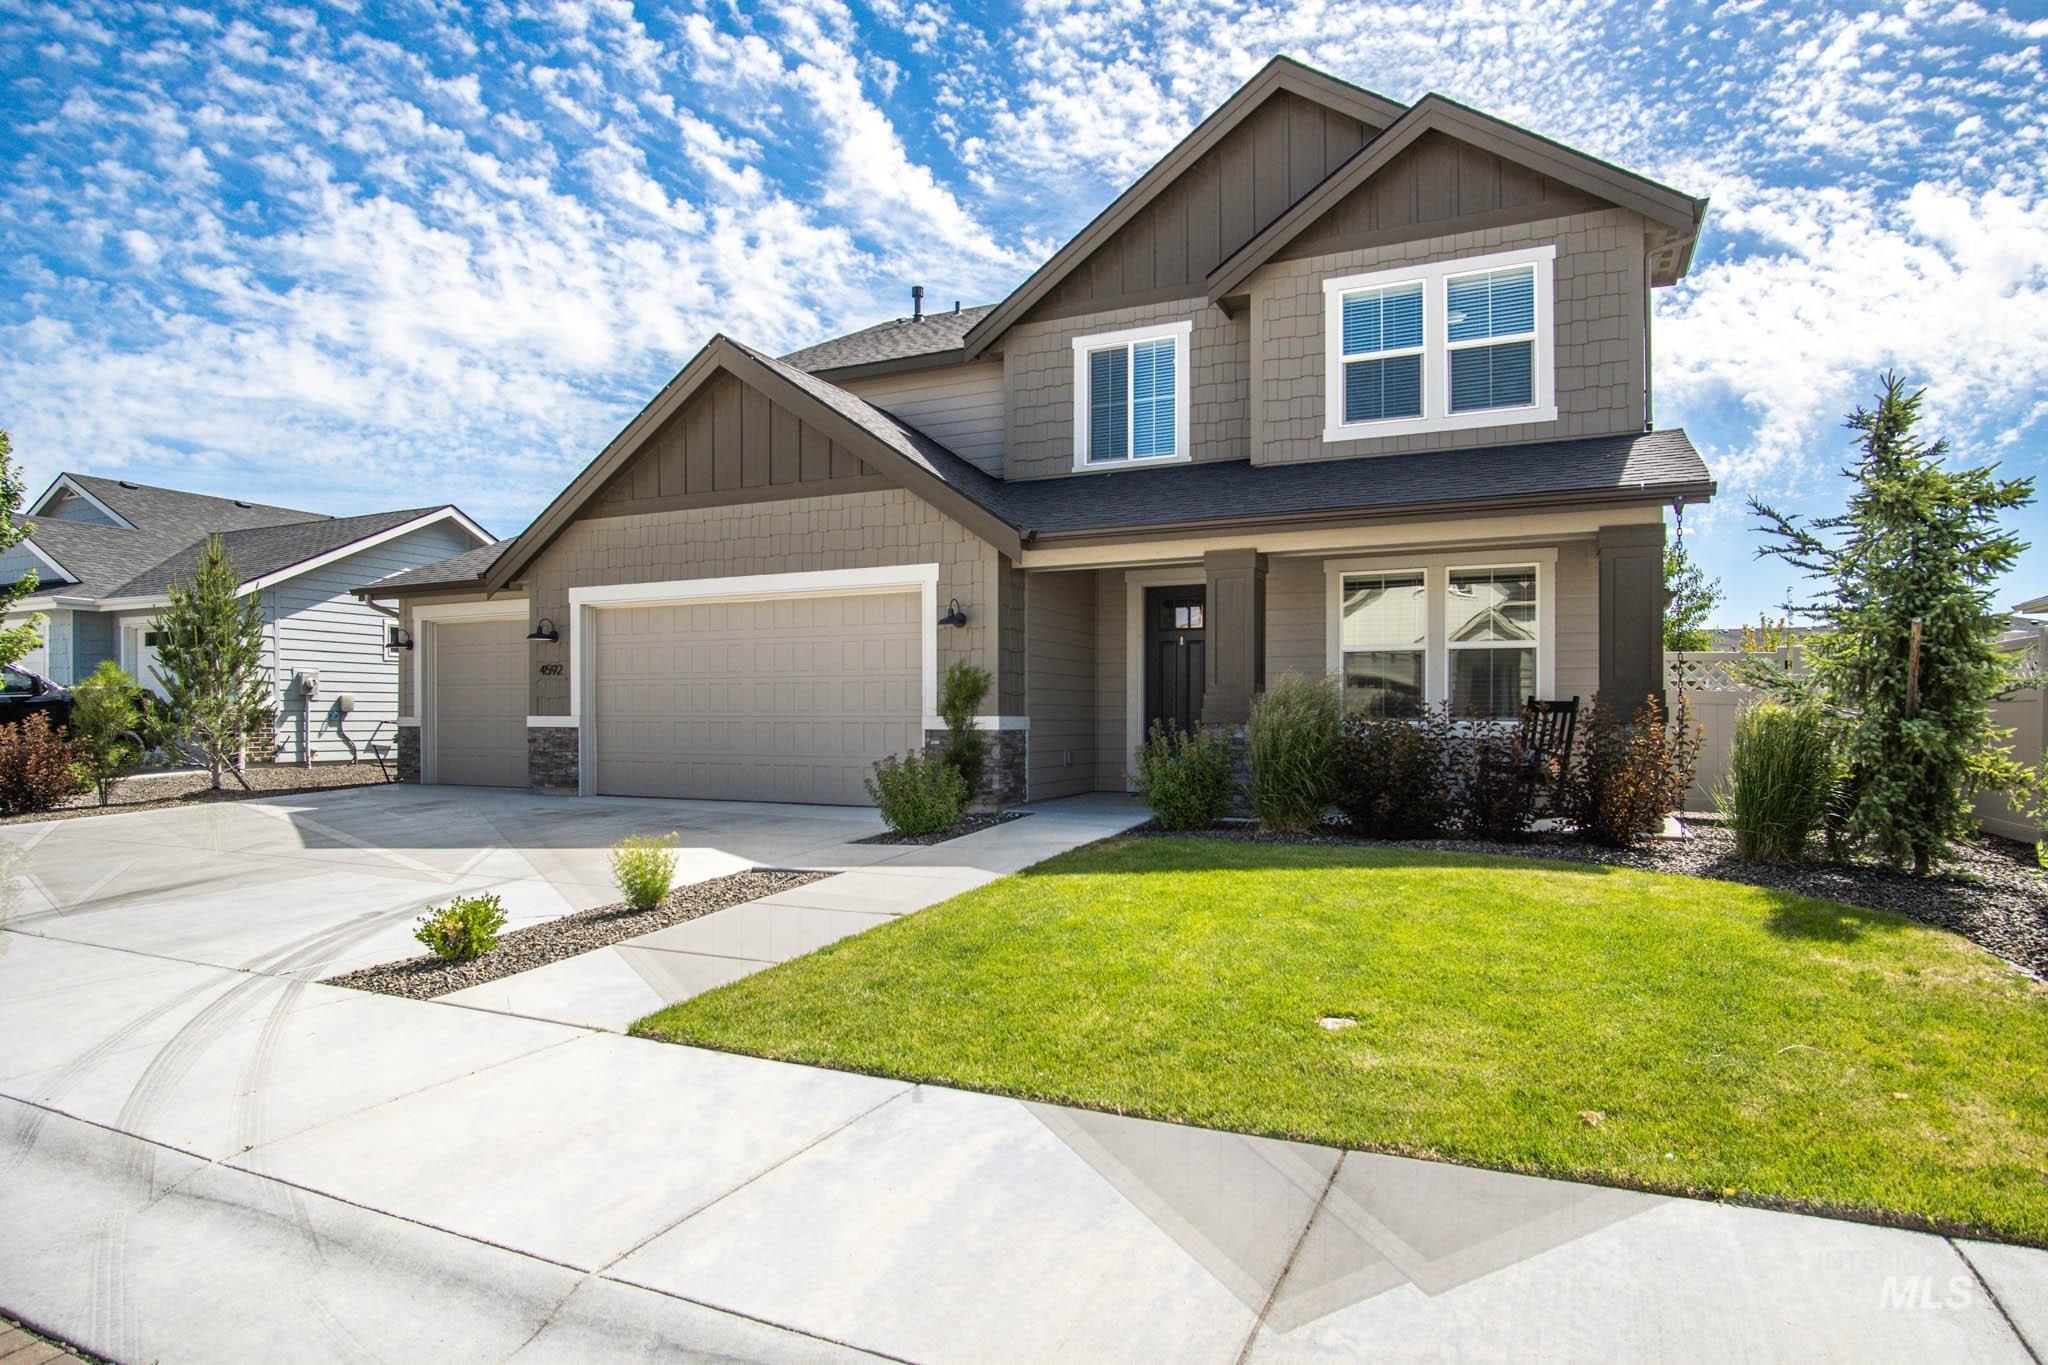 4592 N Girasolo Ave Property Photo 1